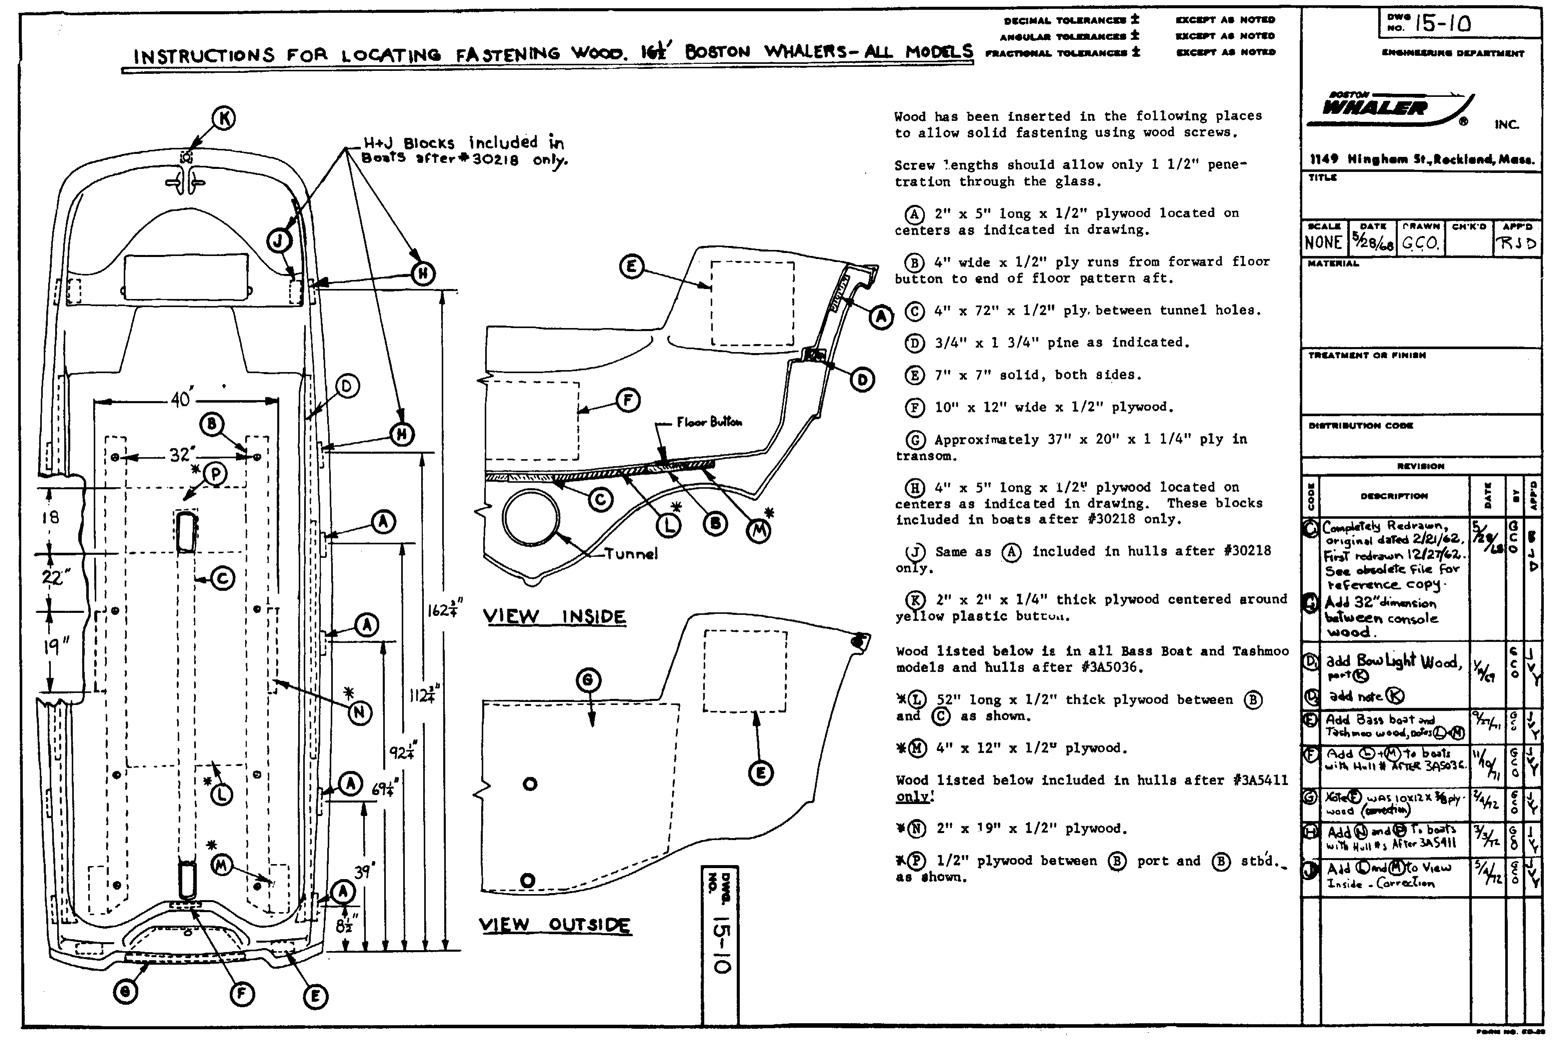 Crane Fireball Hi 6 Ignition Wiring Diagram 43. Crane Cam Fireball Hi 6r Ignition Wiring Diagrams 16wooddwg15 10resize\\\\\\\\\\\\. Wiring. Crane Cams Ignition Wiring Diagrams At Scoala.co